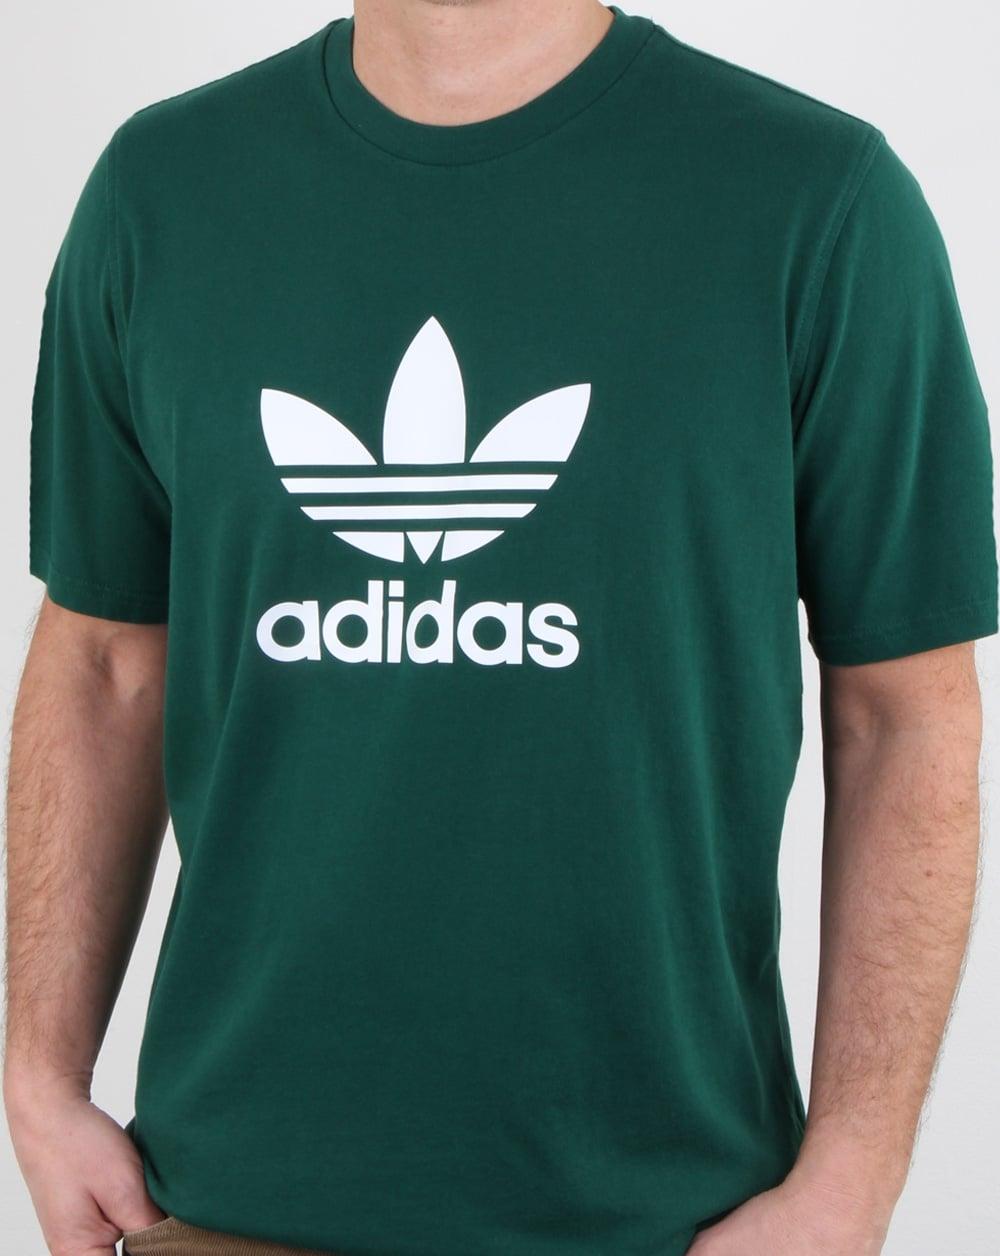 adidas sst sweatshirt green